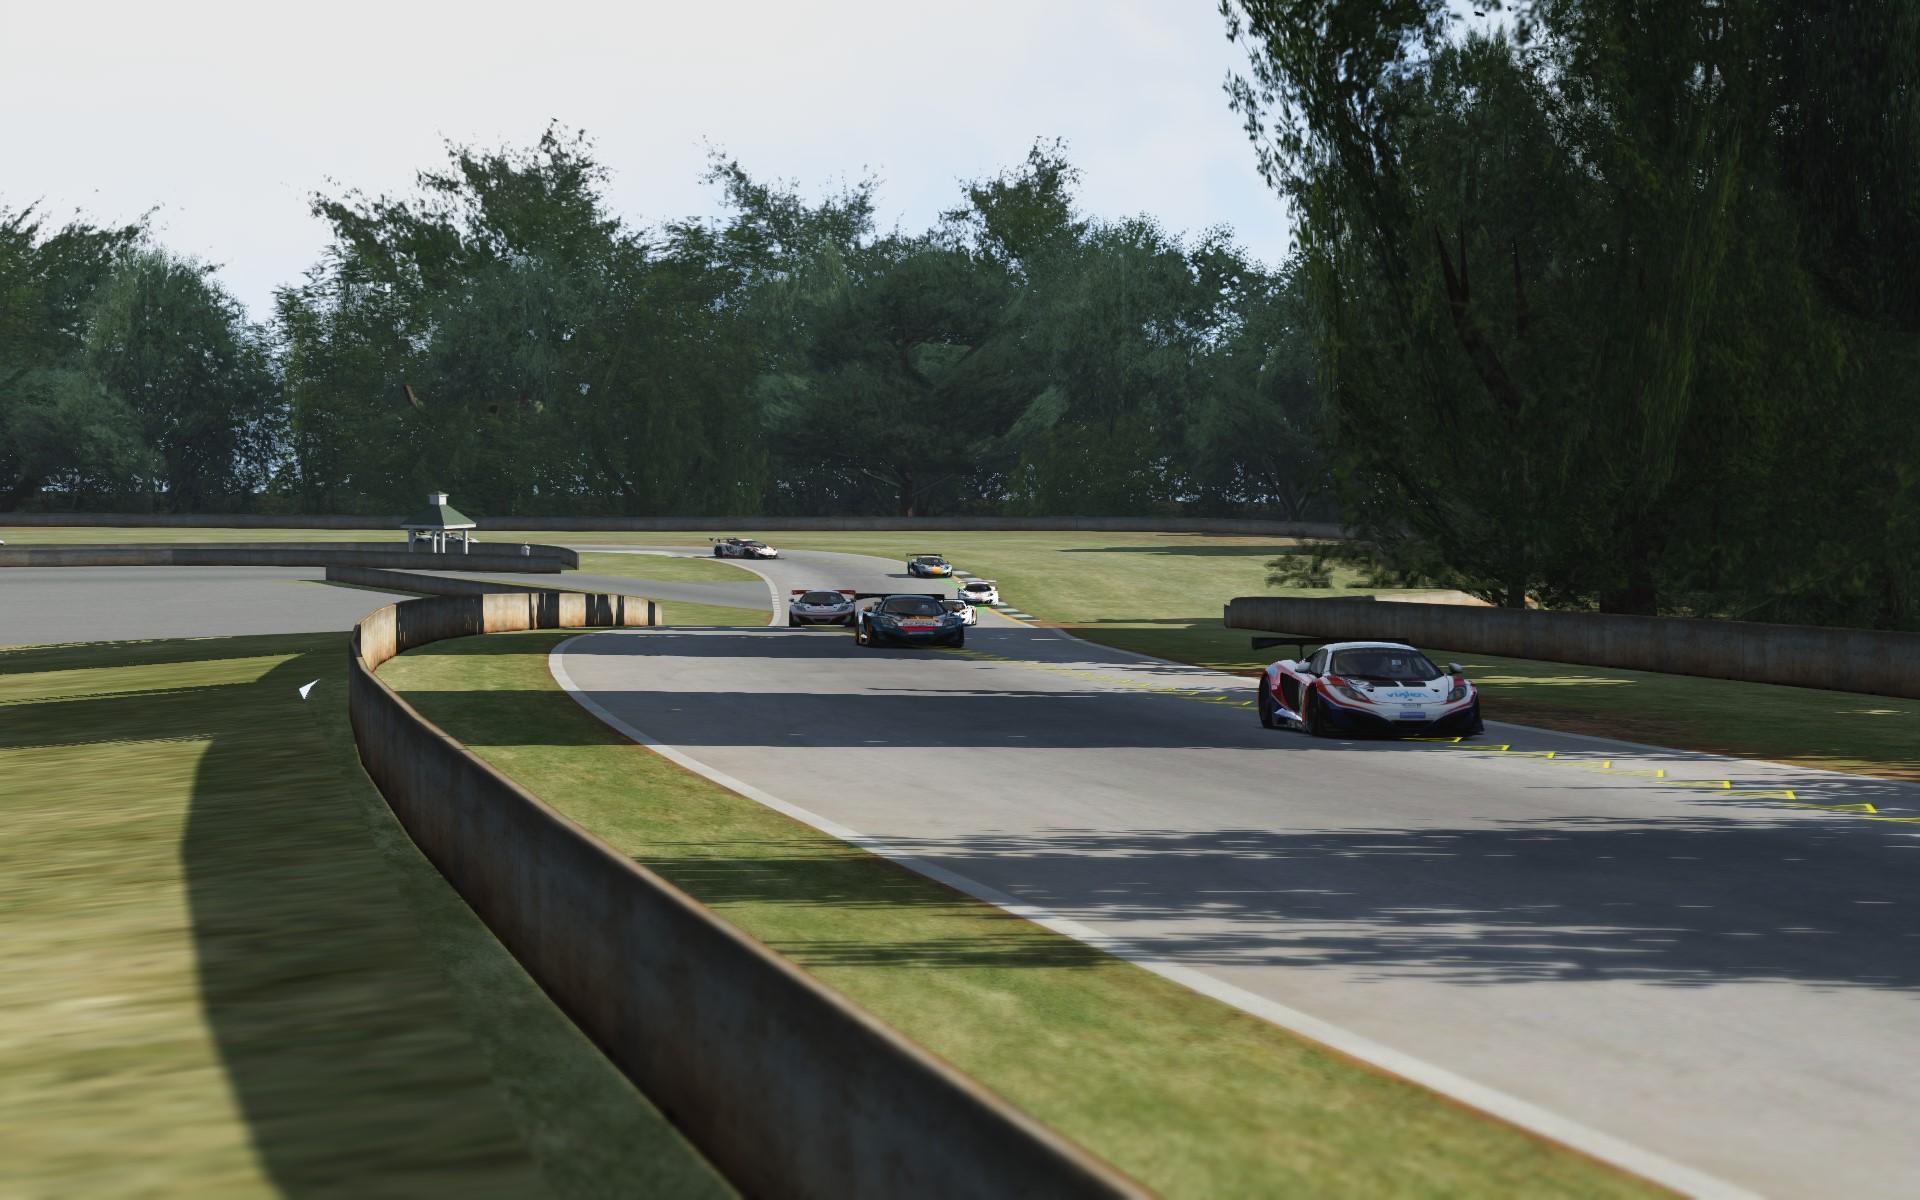 Screenshot_mclaren_mp412c_gt3_road atlanta_10-8-115-14-0-45.jpg